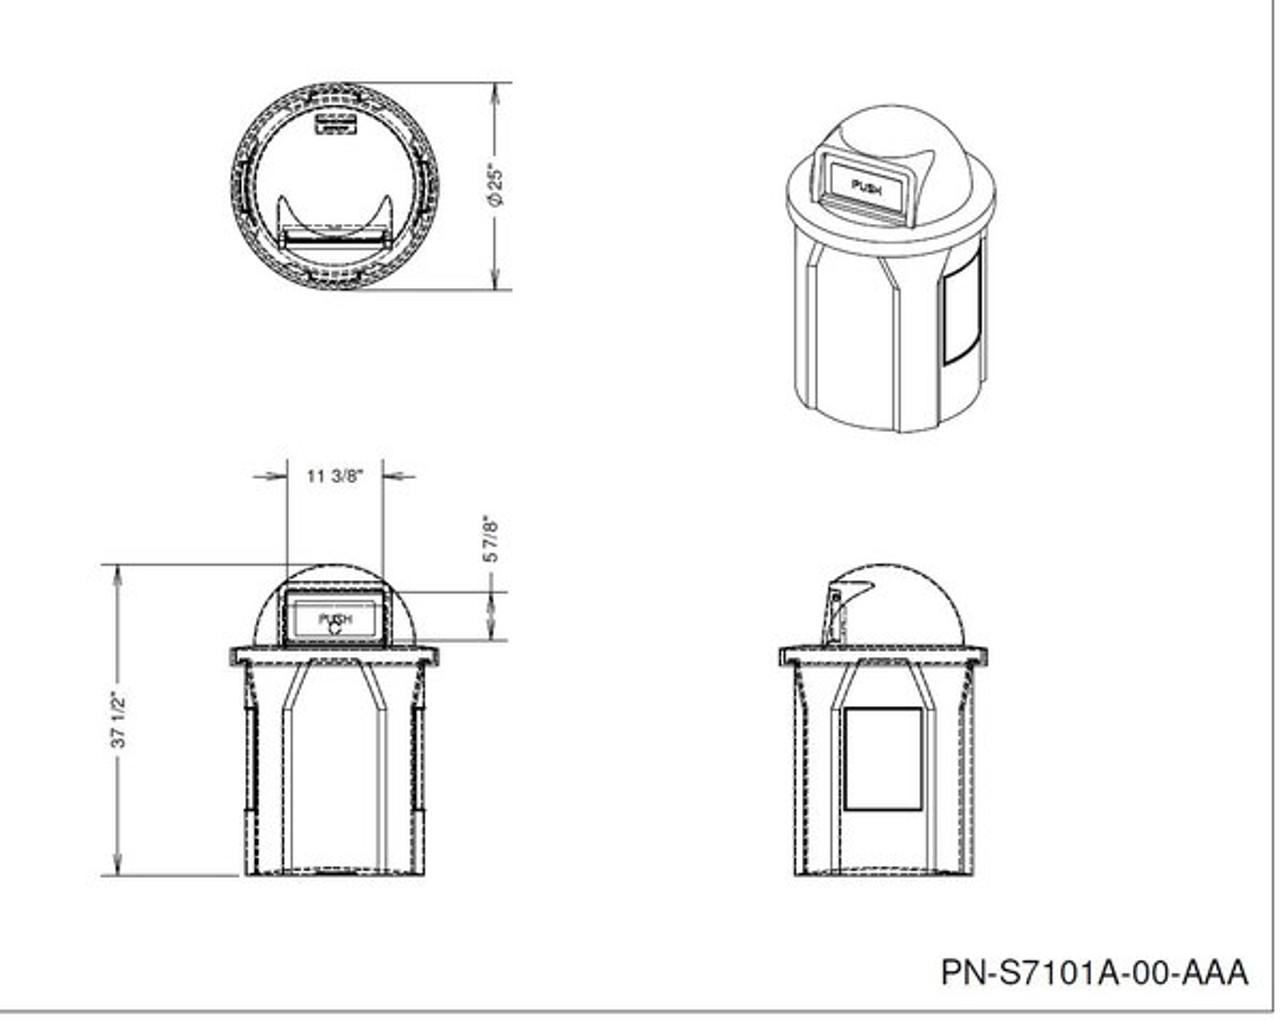 Kolor Can 42 Gallon Push Door Opening Drawing